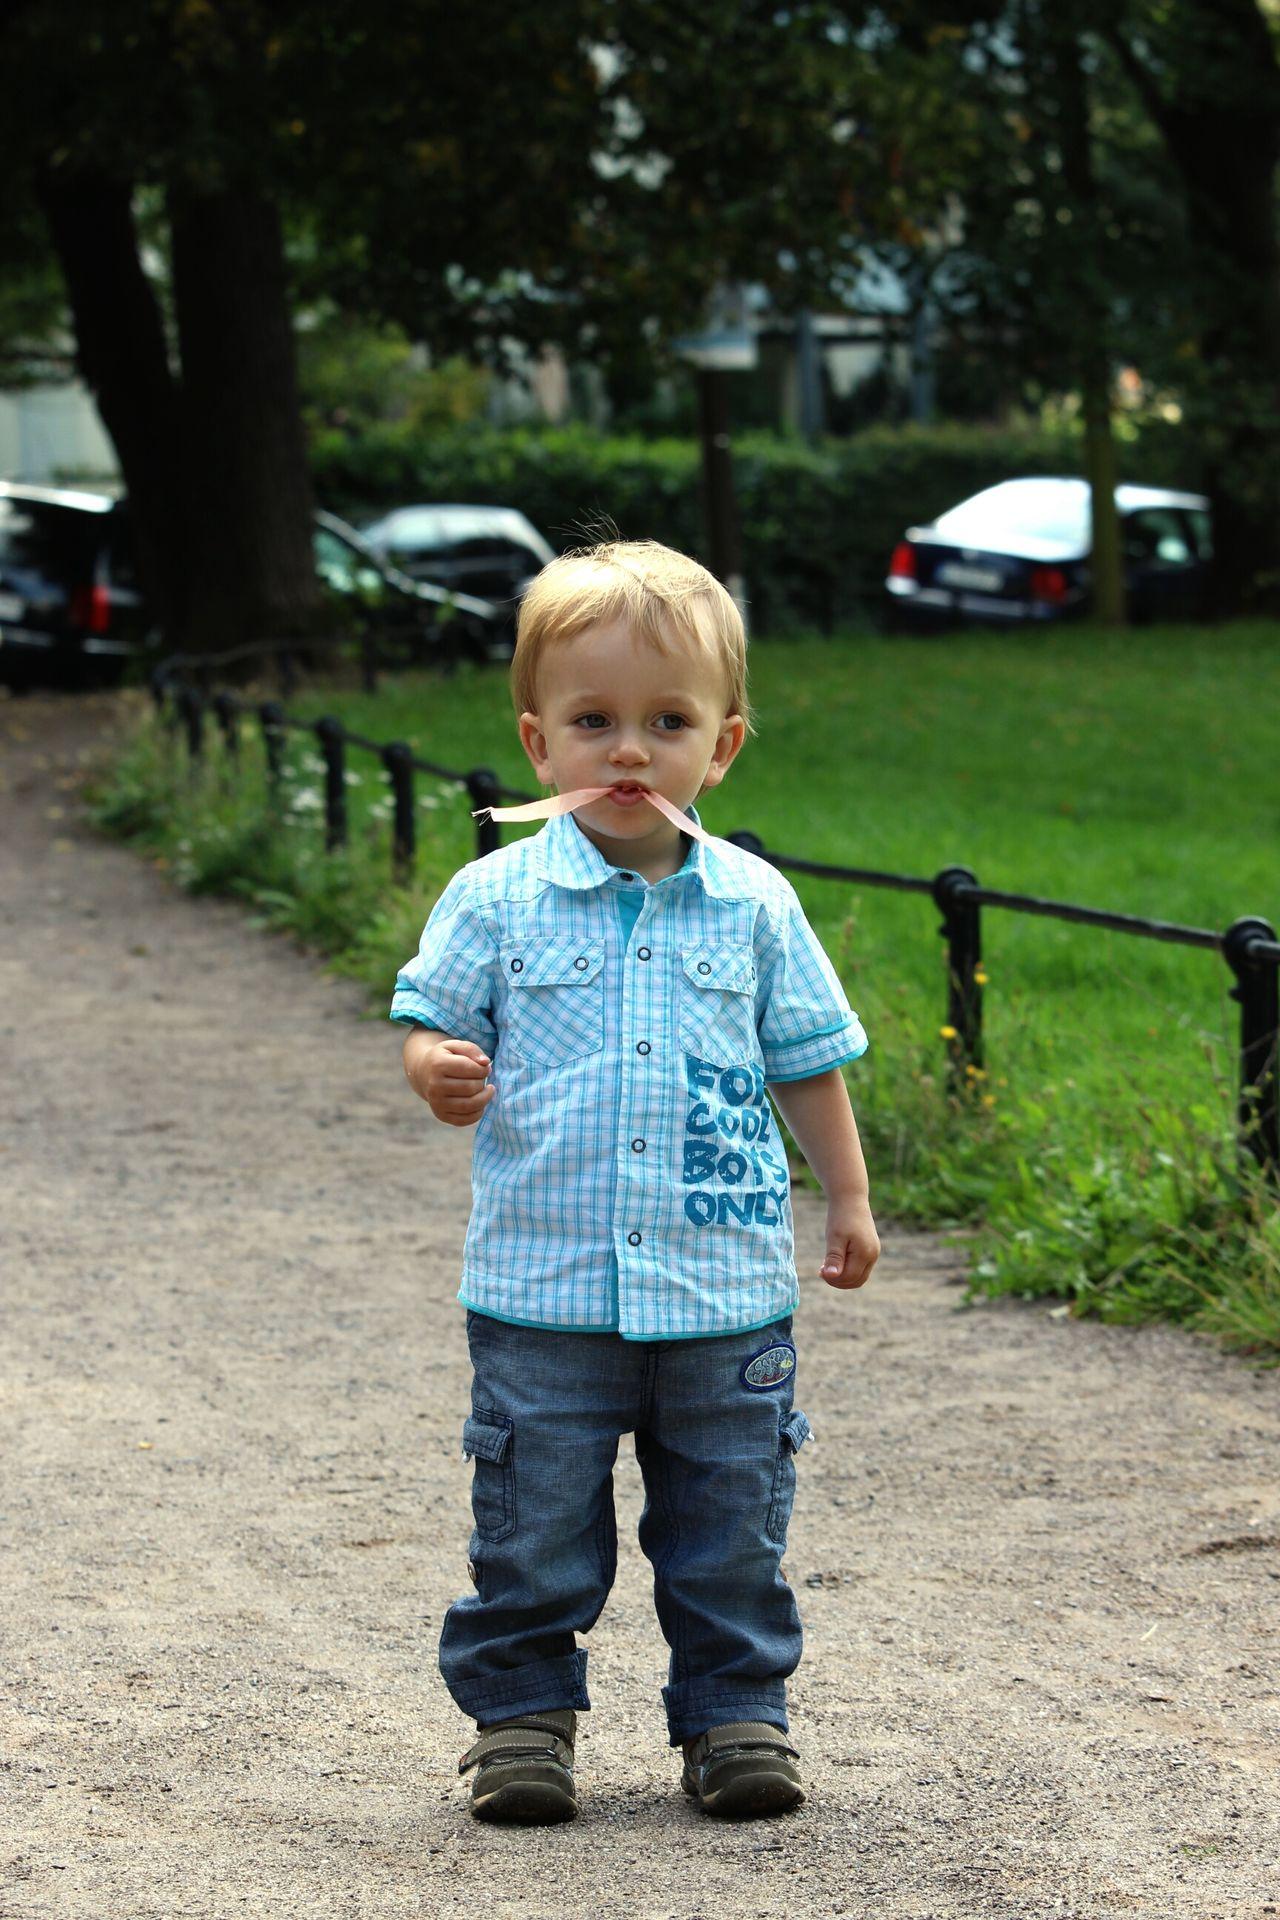 Beautiful stock photos of boy, Blond Hair, Boys, Casual Clothing, Caucasian Ethnicity